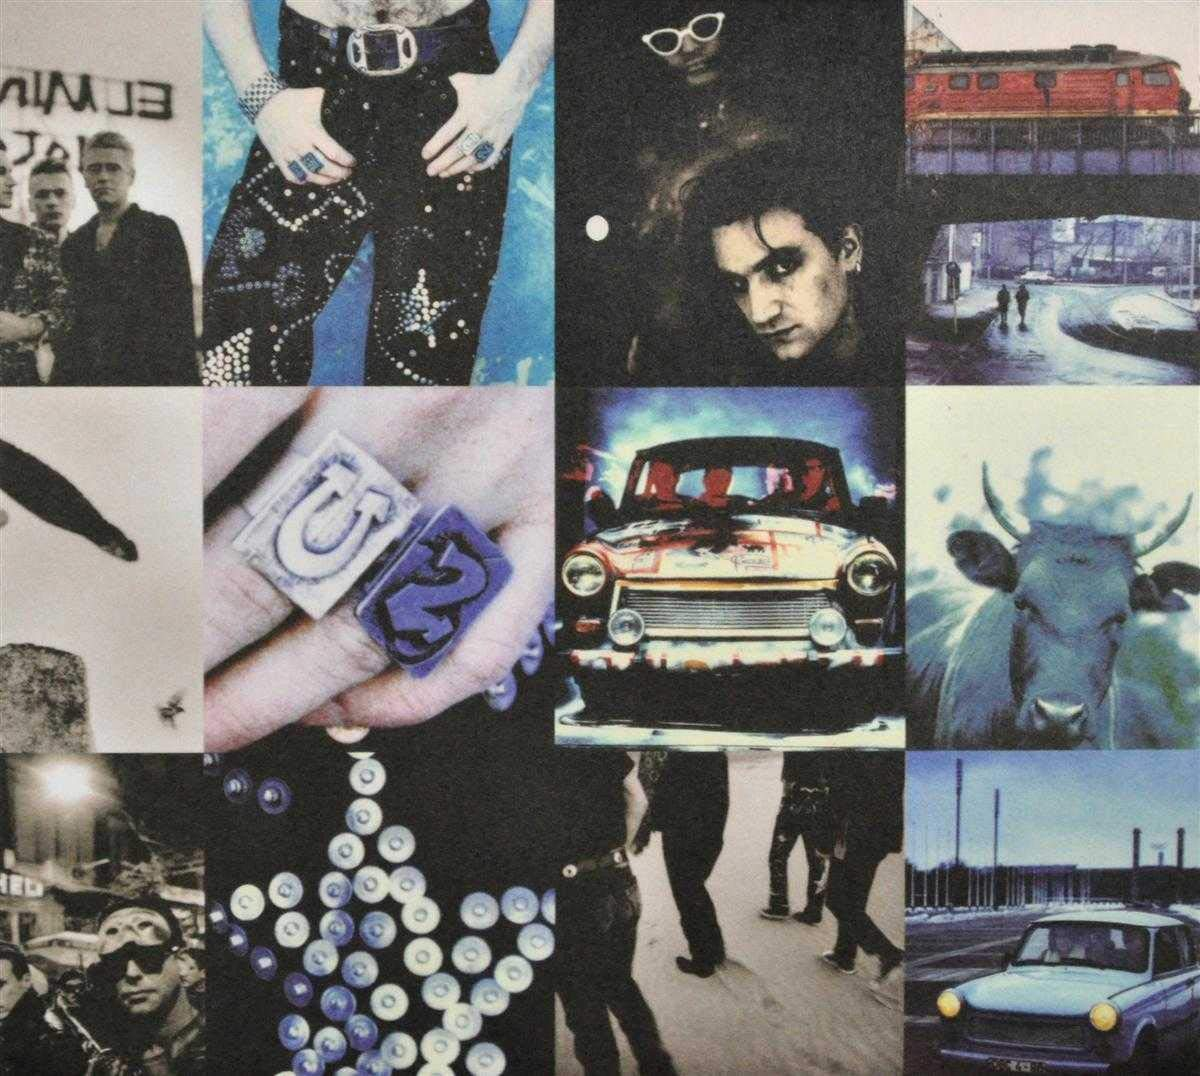 Achtung Baby 20 : U2: Amazon.es: Música